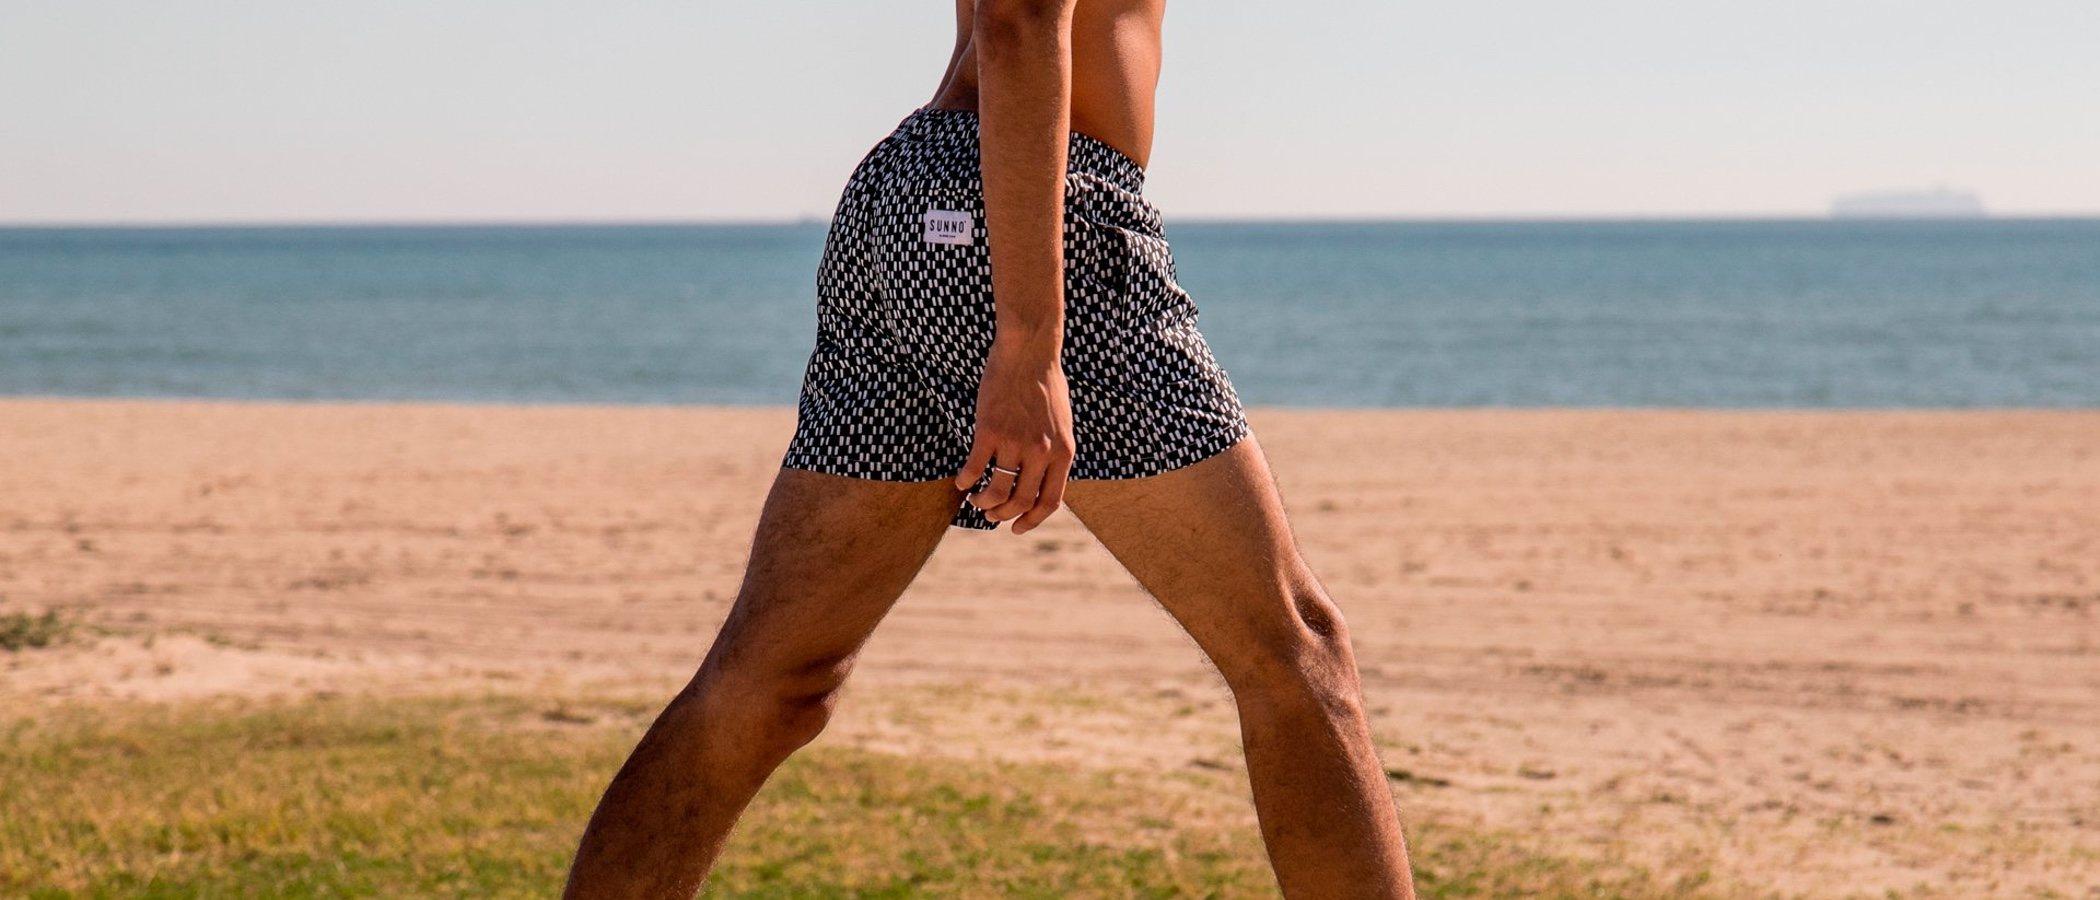 Necesitar Vas Benne Bañadores A Este CapeLos Únicos By Que Sunno TKJFlc1